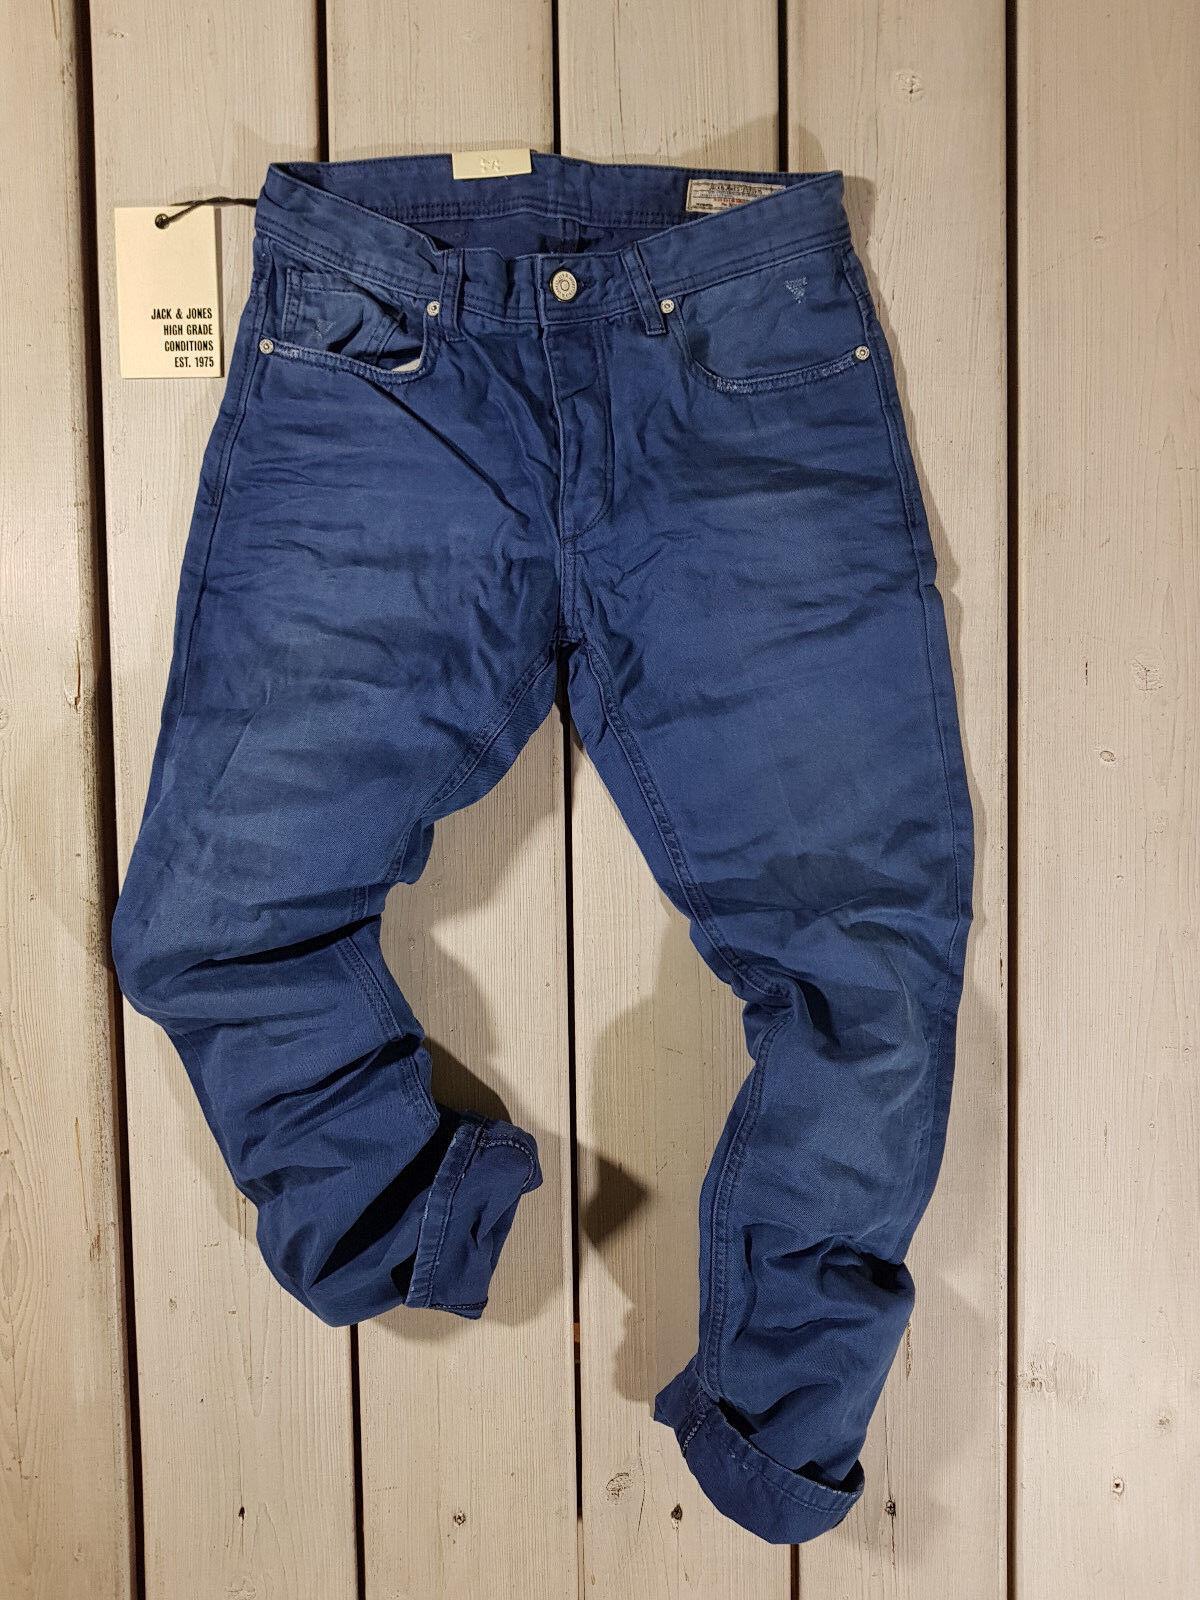 RRP NEW JACK /& JONES MEN/'S JEANS JJ 577 BOXY POWEL STONEWASHED BLUE